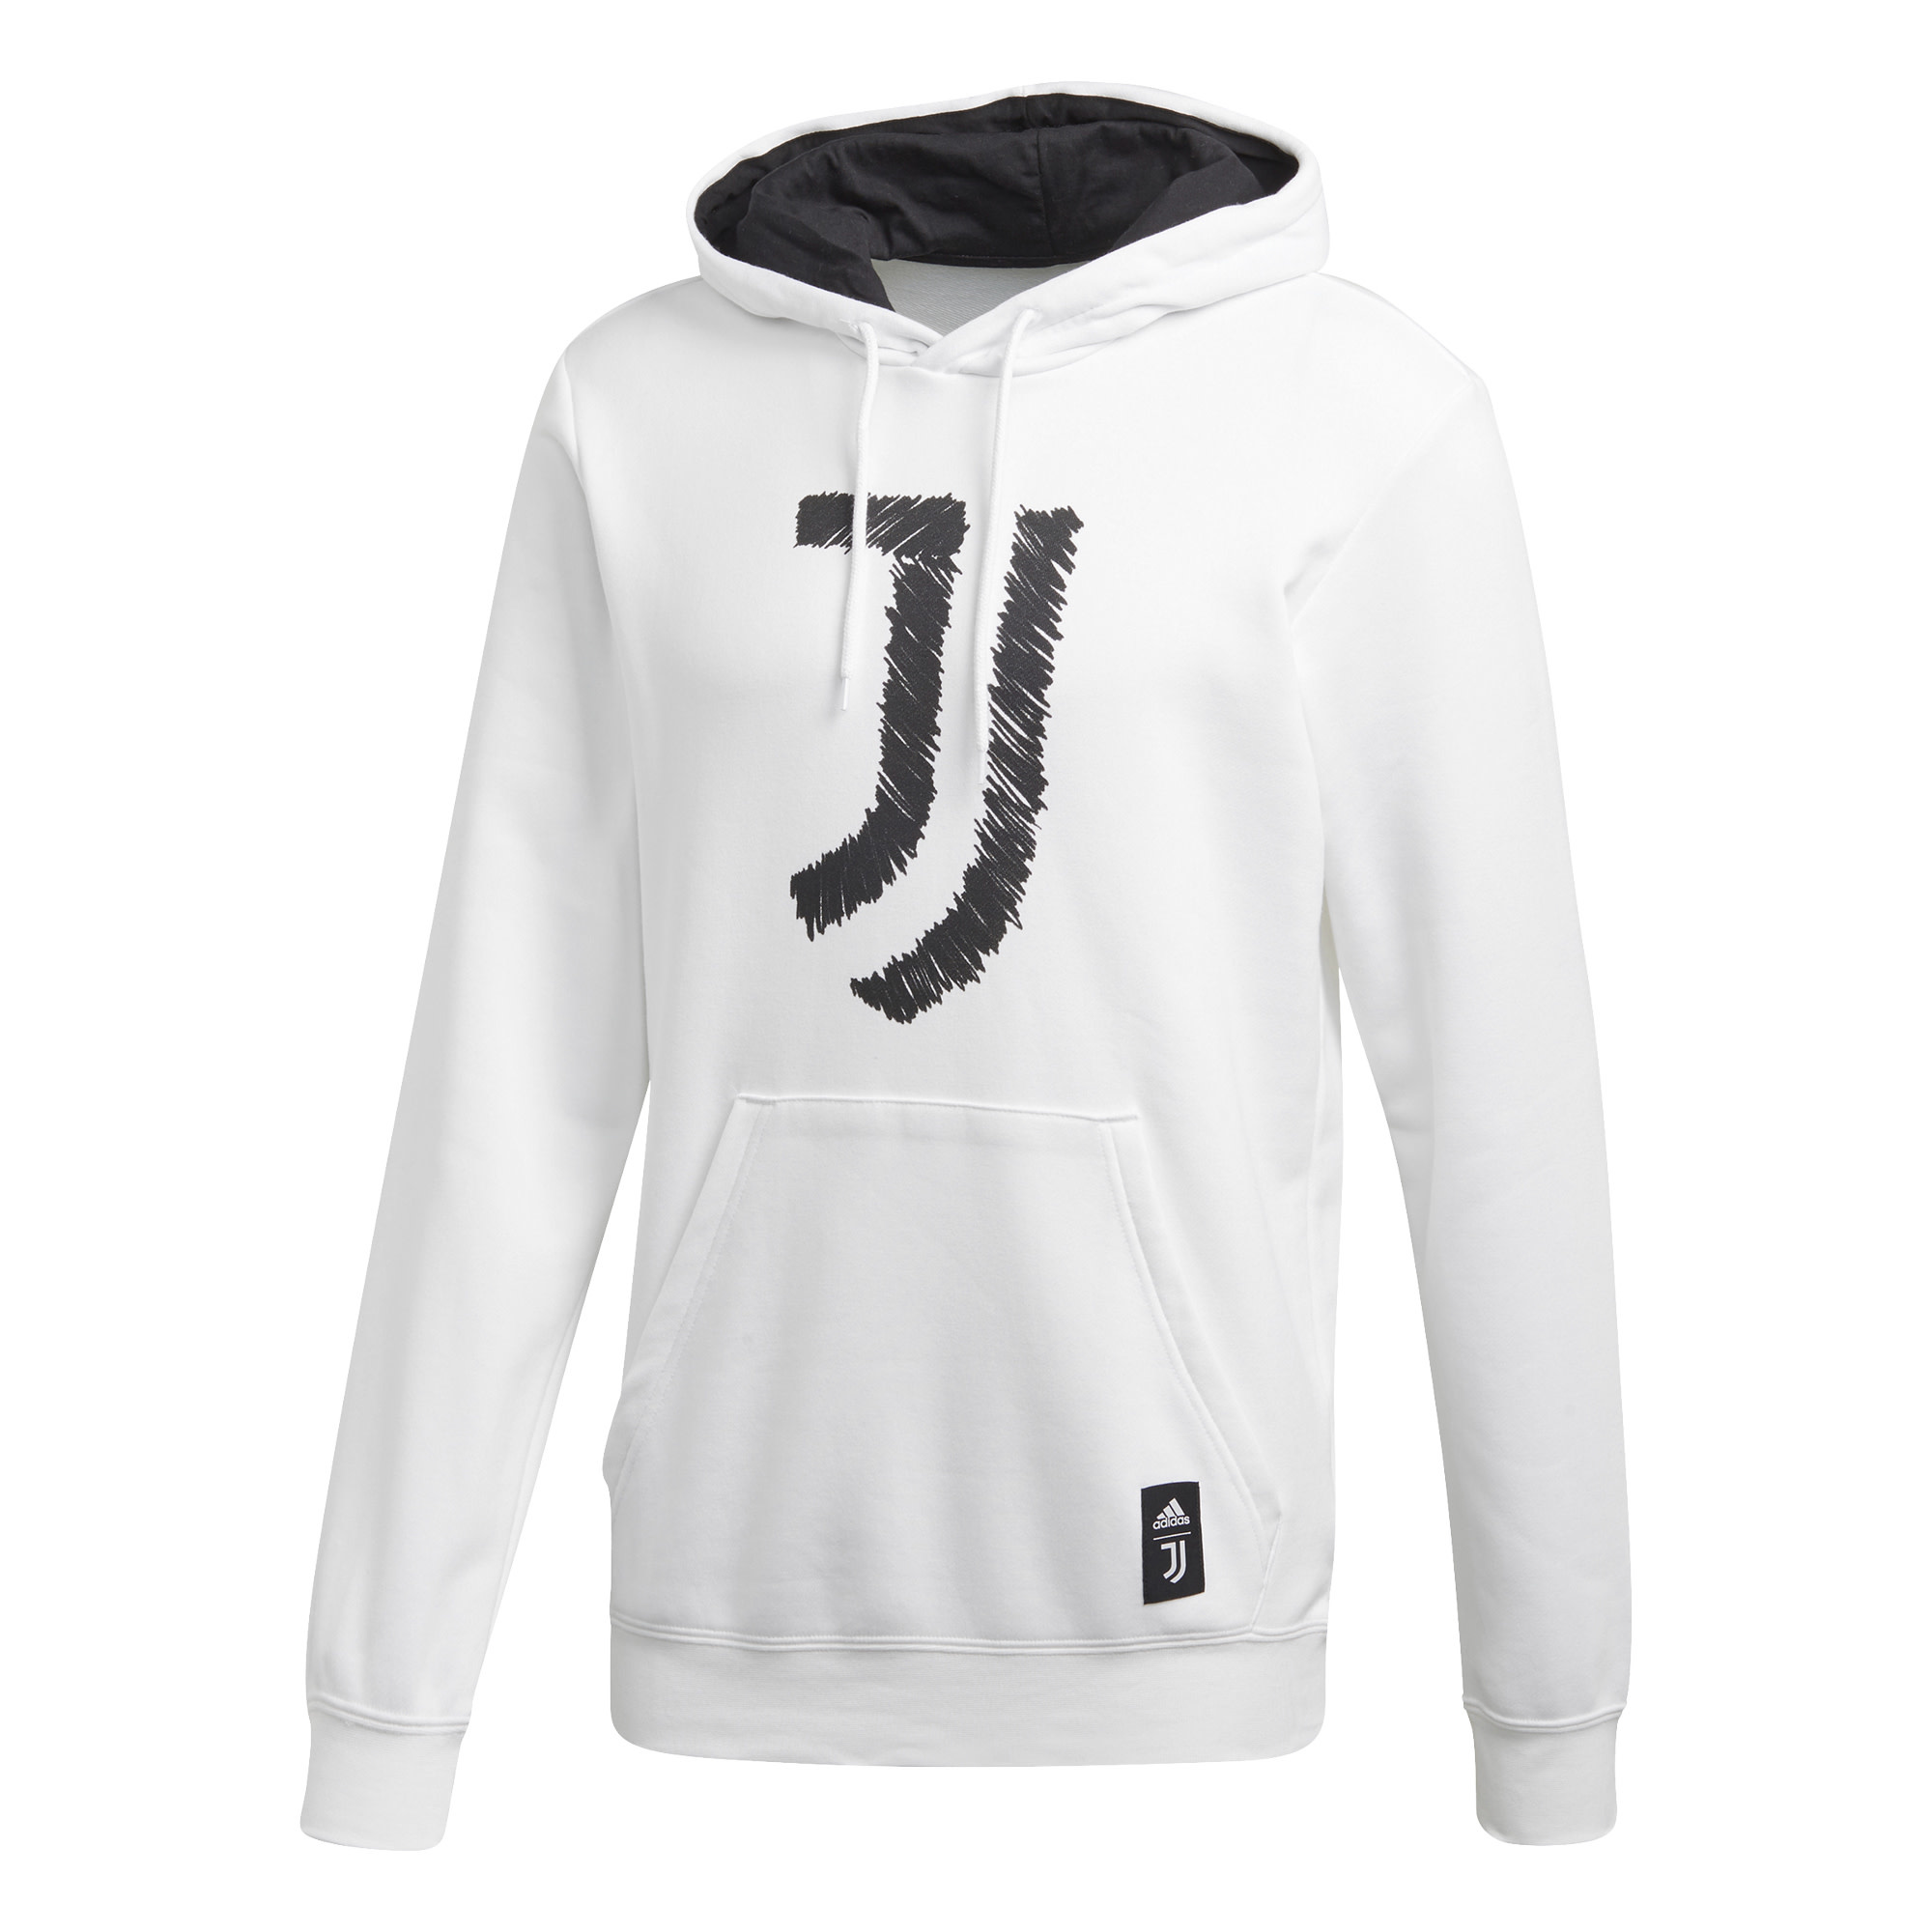 Adidas ADIDAS Juventus DNA Hoody